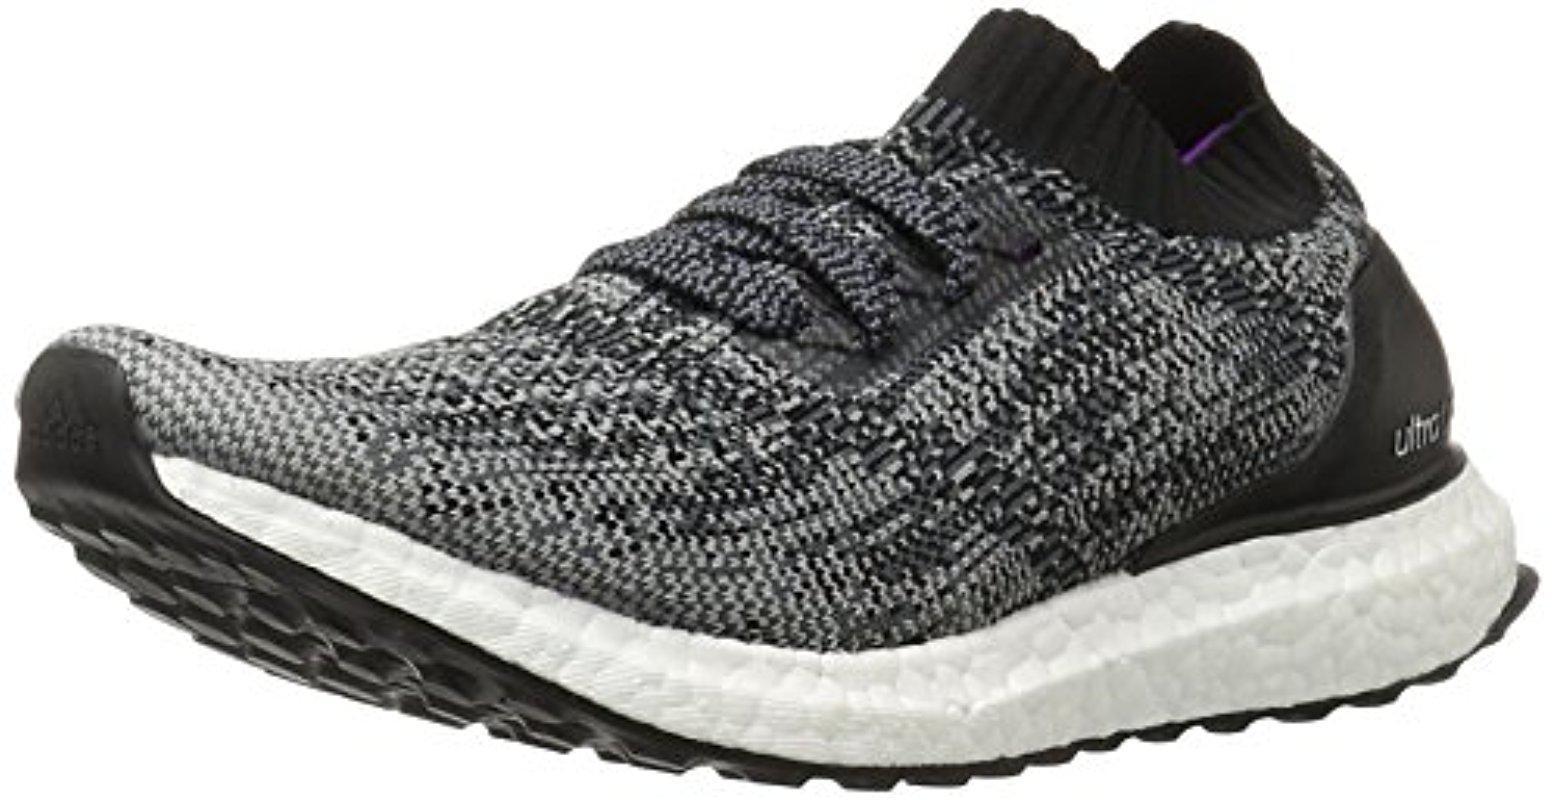 84145c8b85ced Lyst - adidas Performance Ultraboost Uncaged W Running Shoe